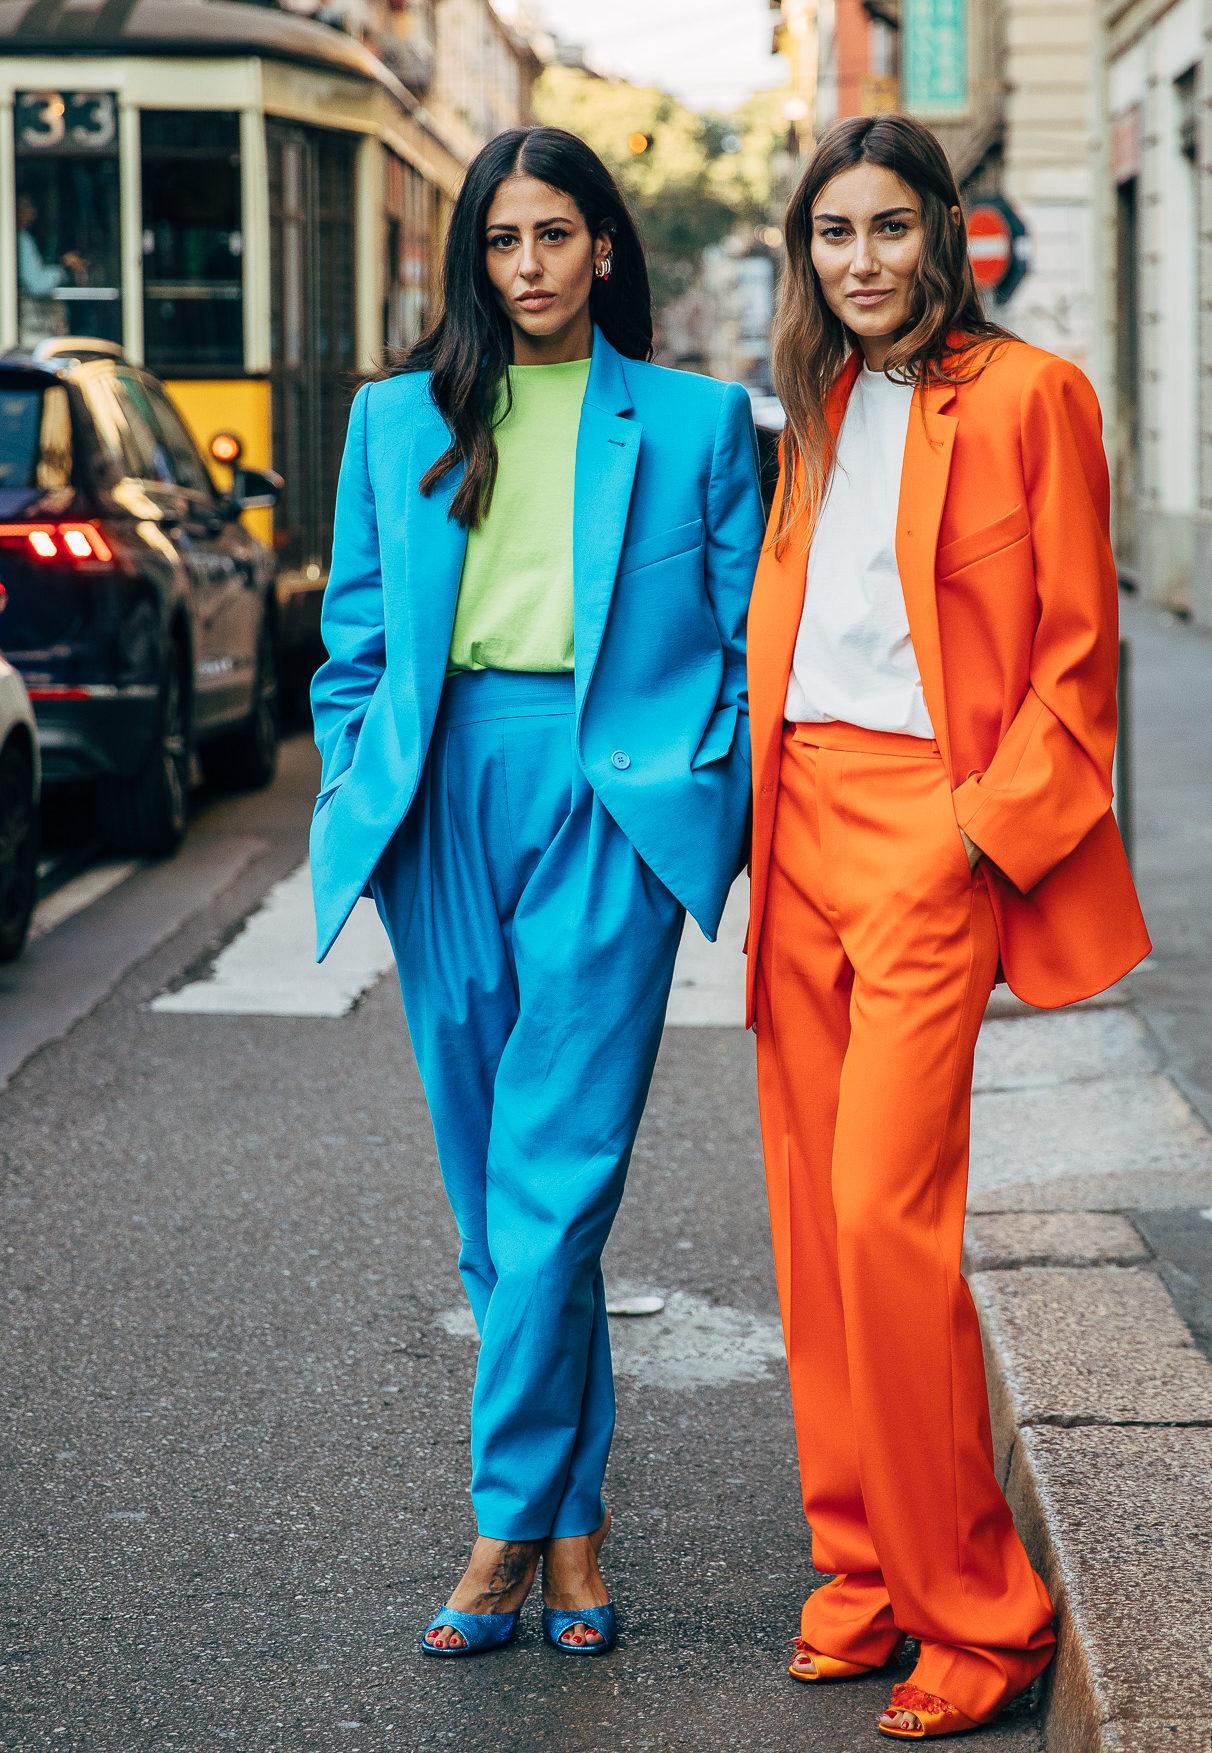 Gilda-Ambrosio-and-Giorgia-Tordini-by-STYLEDUMONDE-Street-Style-Fashion-Photography20190919_48A5103